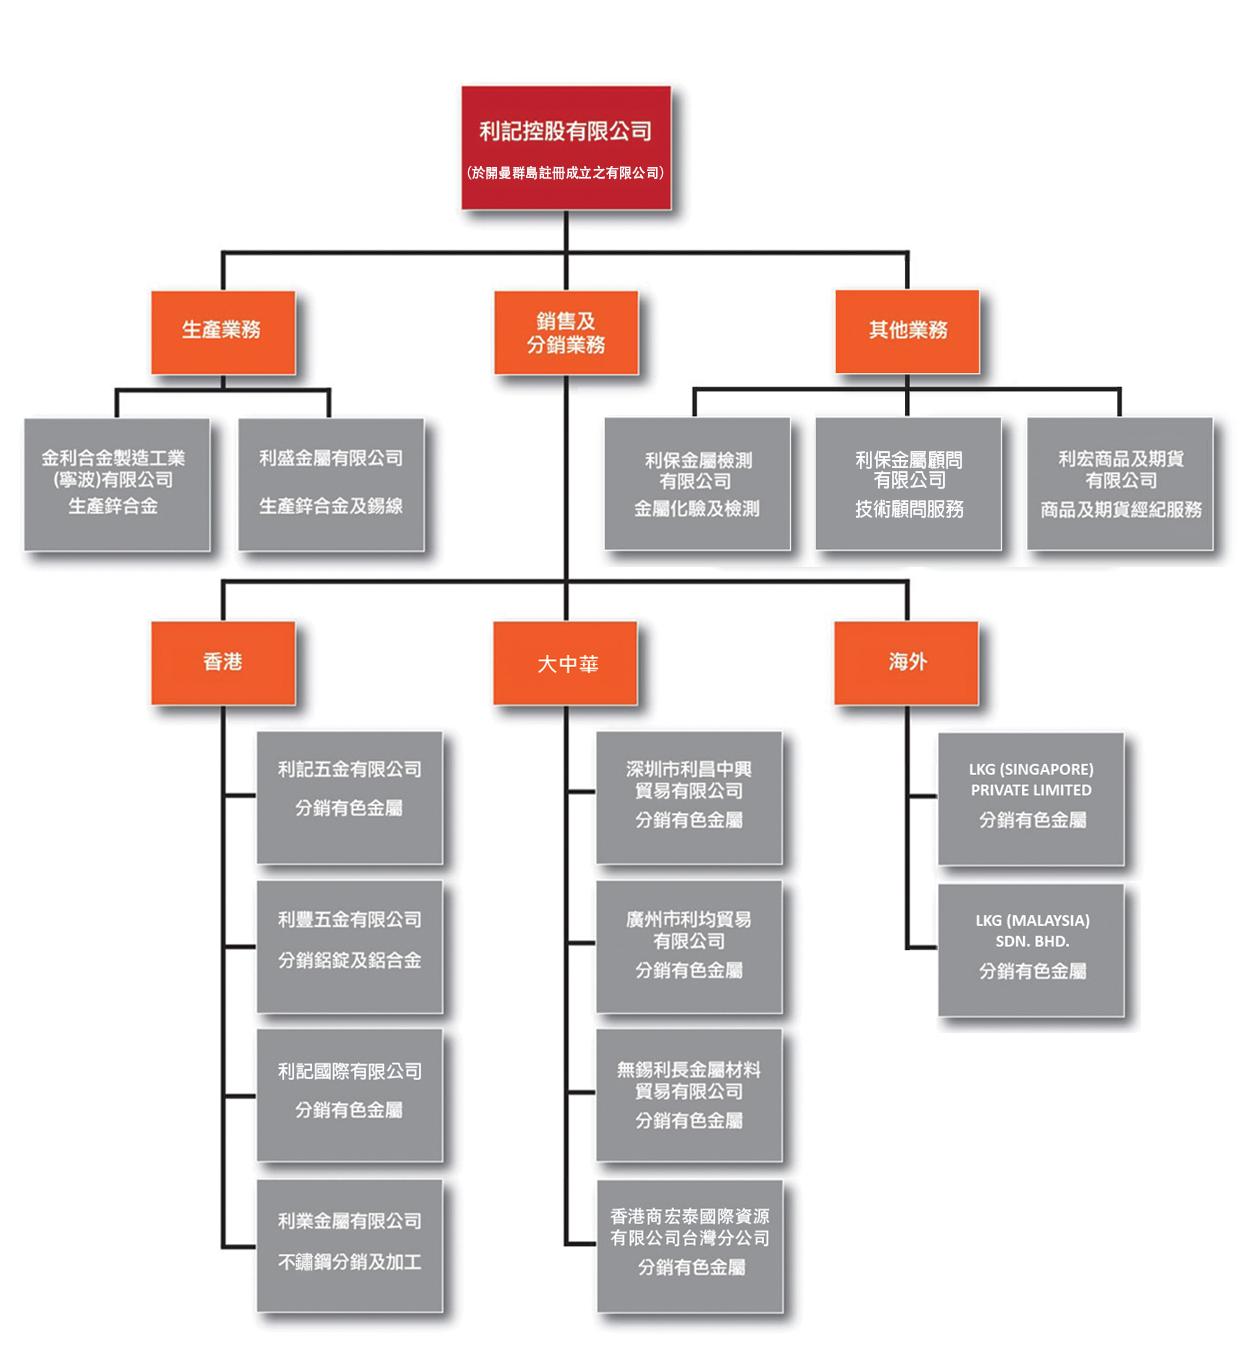 organization structure tc_190726